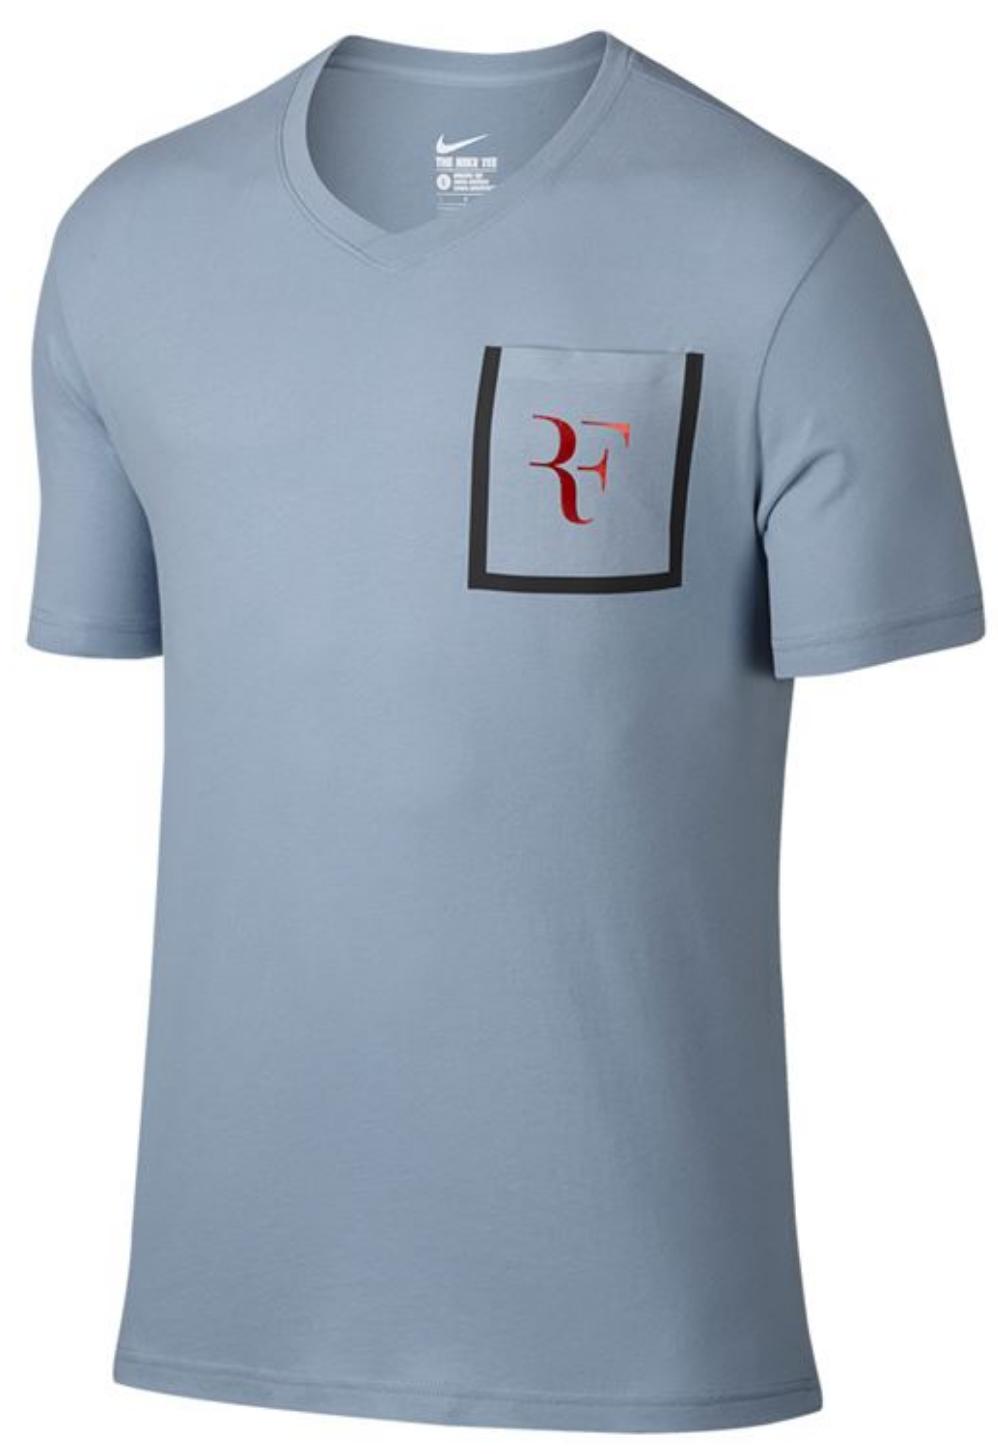 Roger Federer 2017 Hopman Cup RF Shirt 2